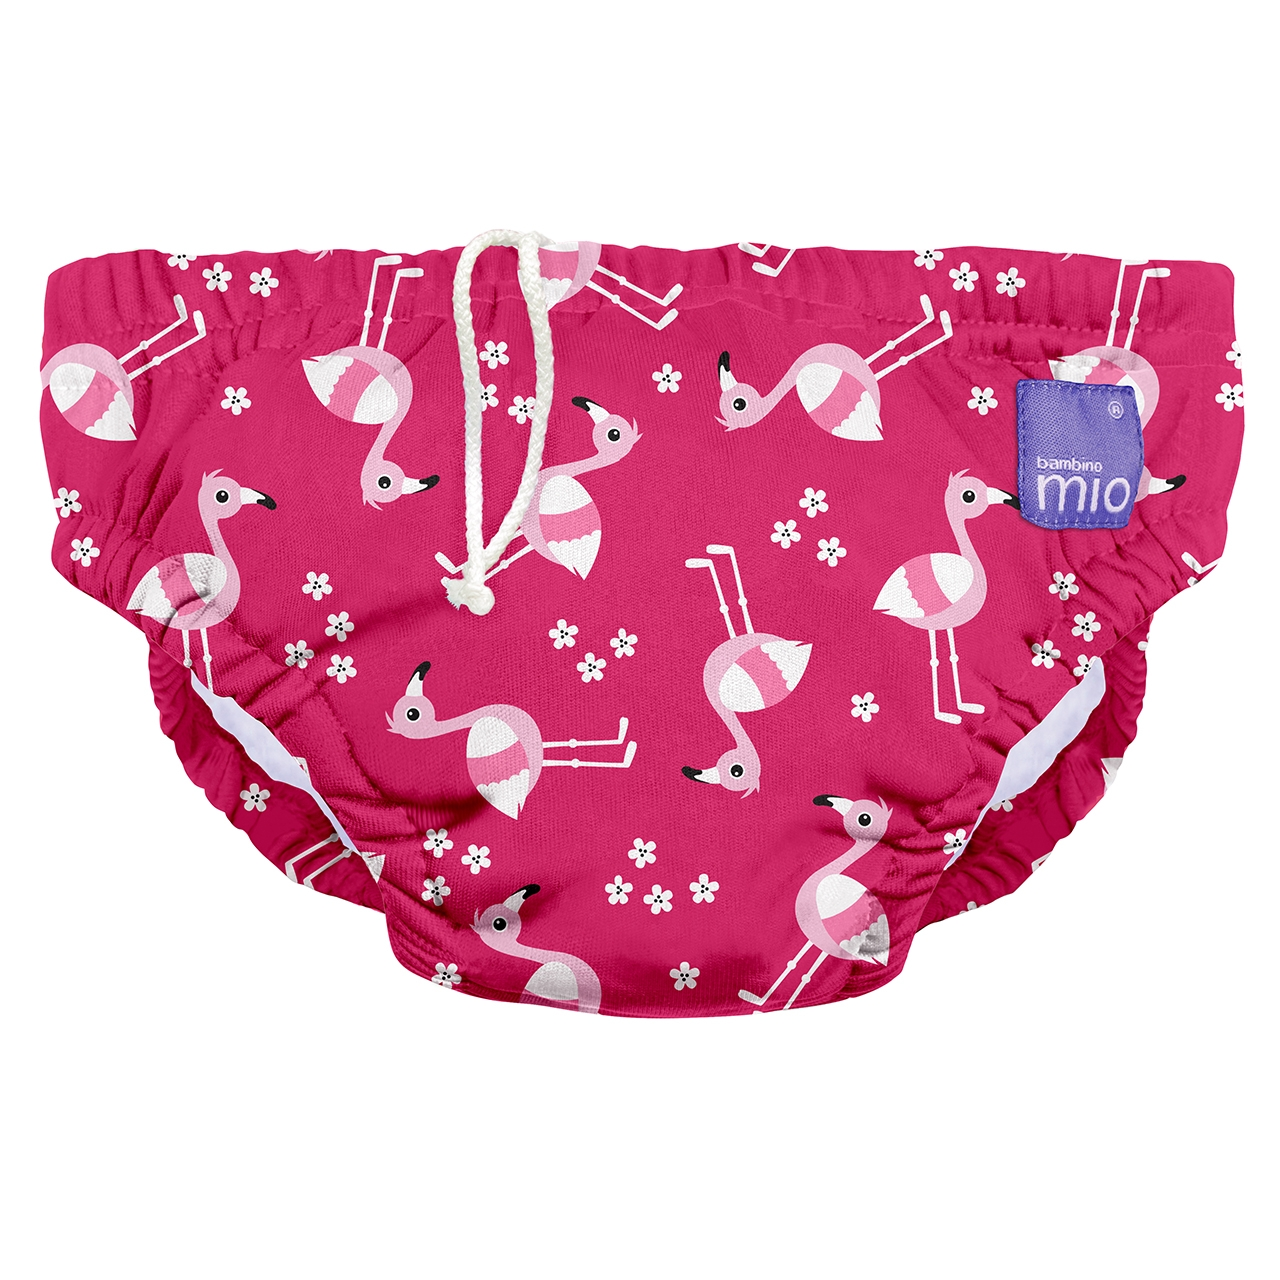 BAMBINO MIO Detské plavky pink flamingo veľ. S